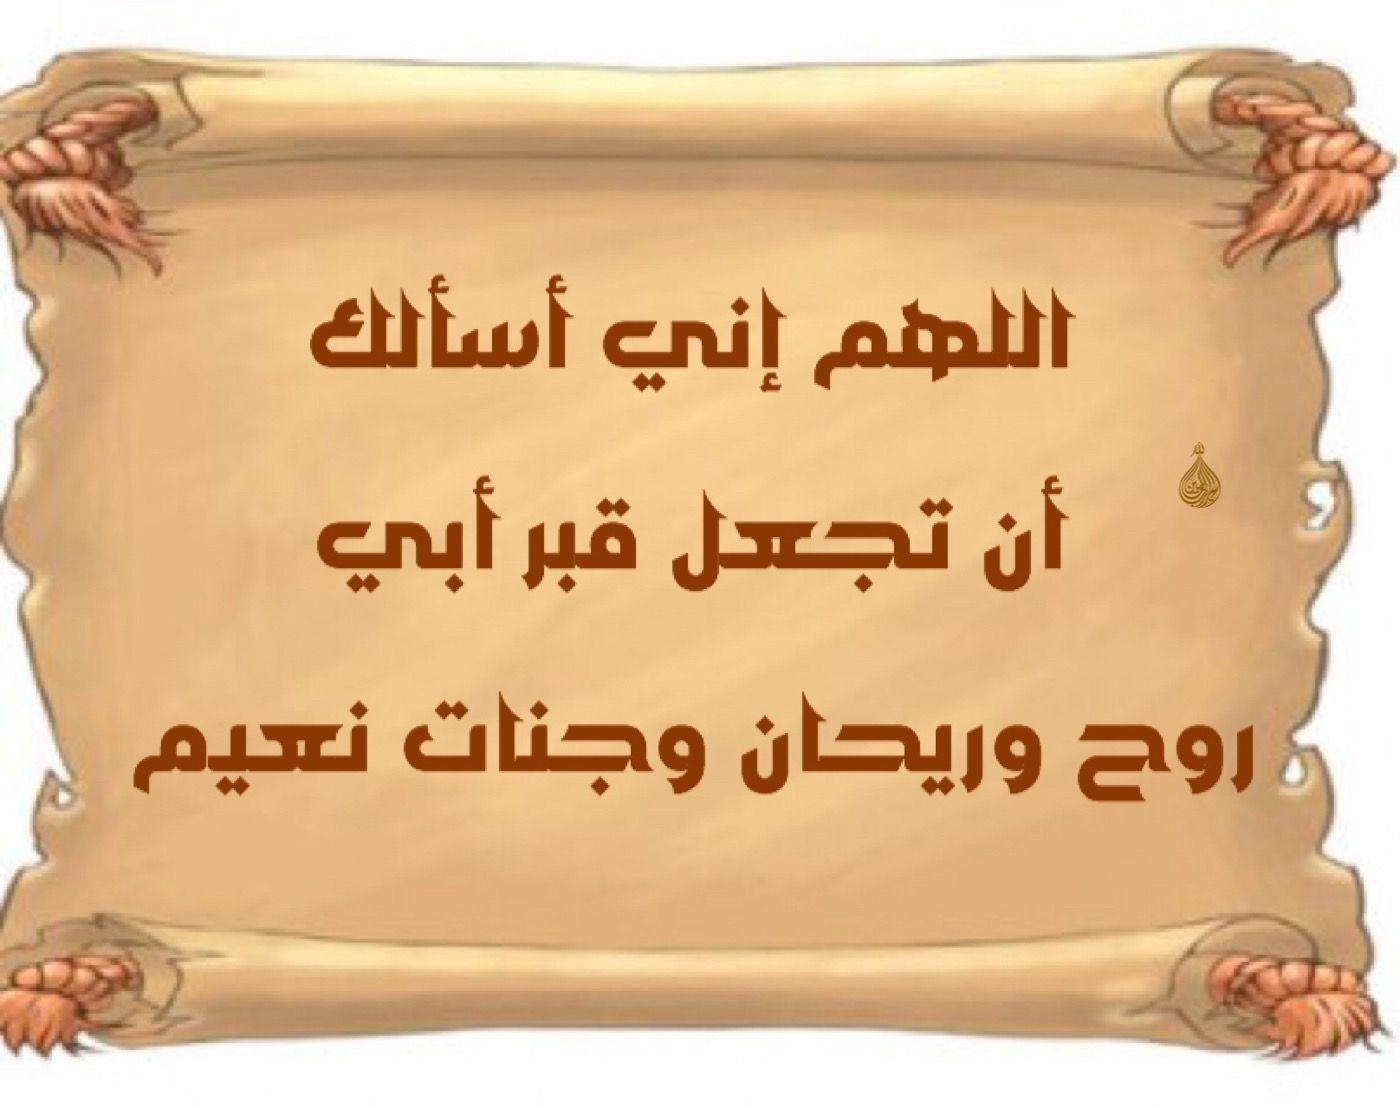 Pin By أدعية إسلامية دعاء أأذكار الج On اللهم ارحم أبى Arabic Calligraphy Calligraphy